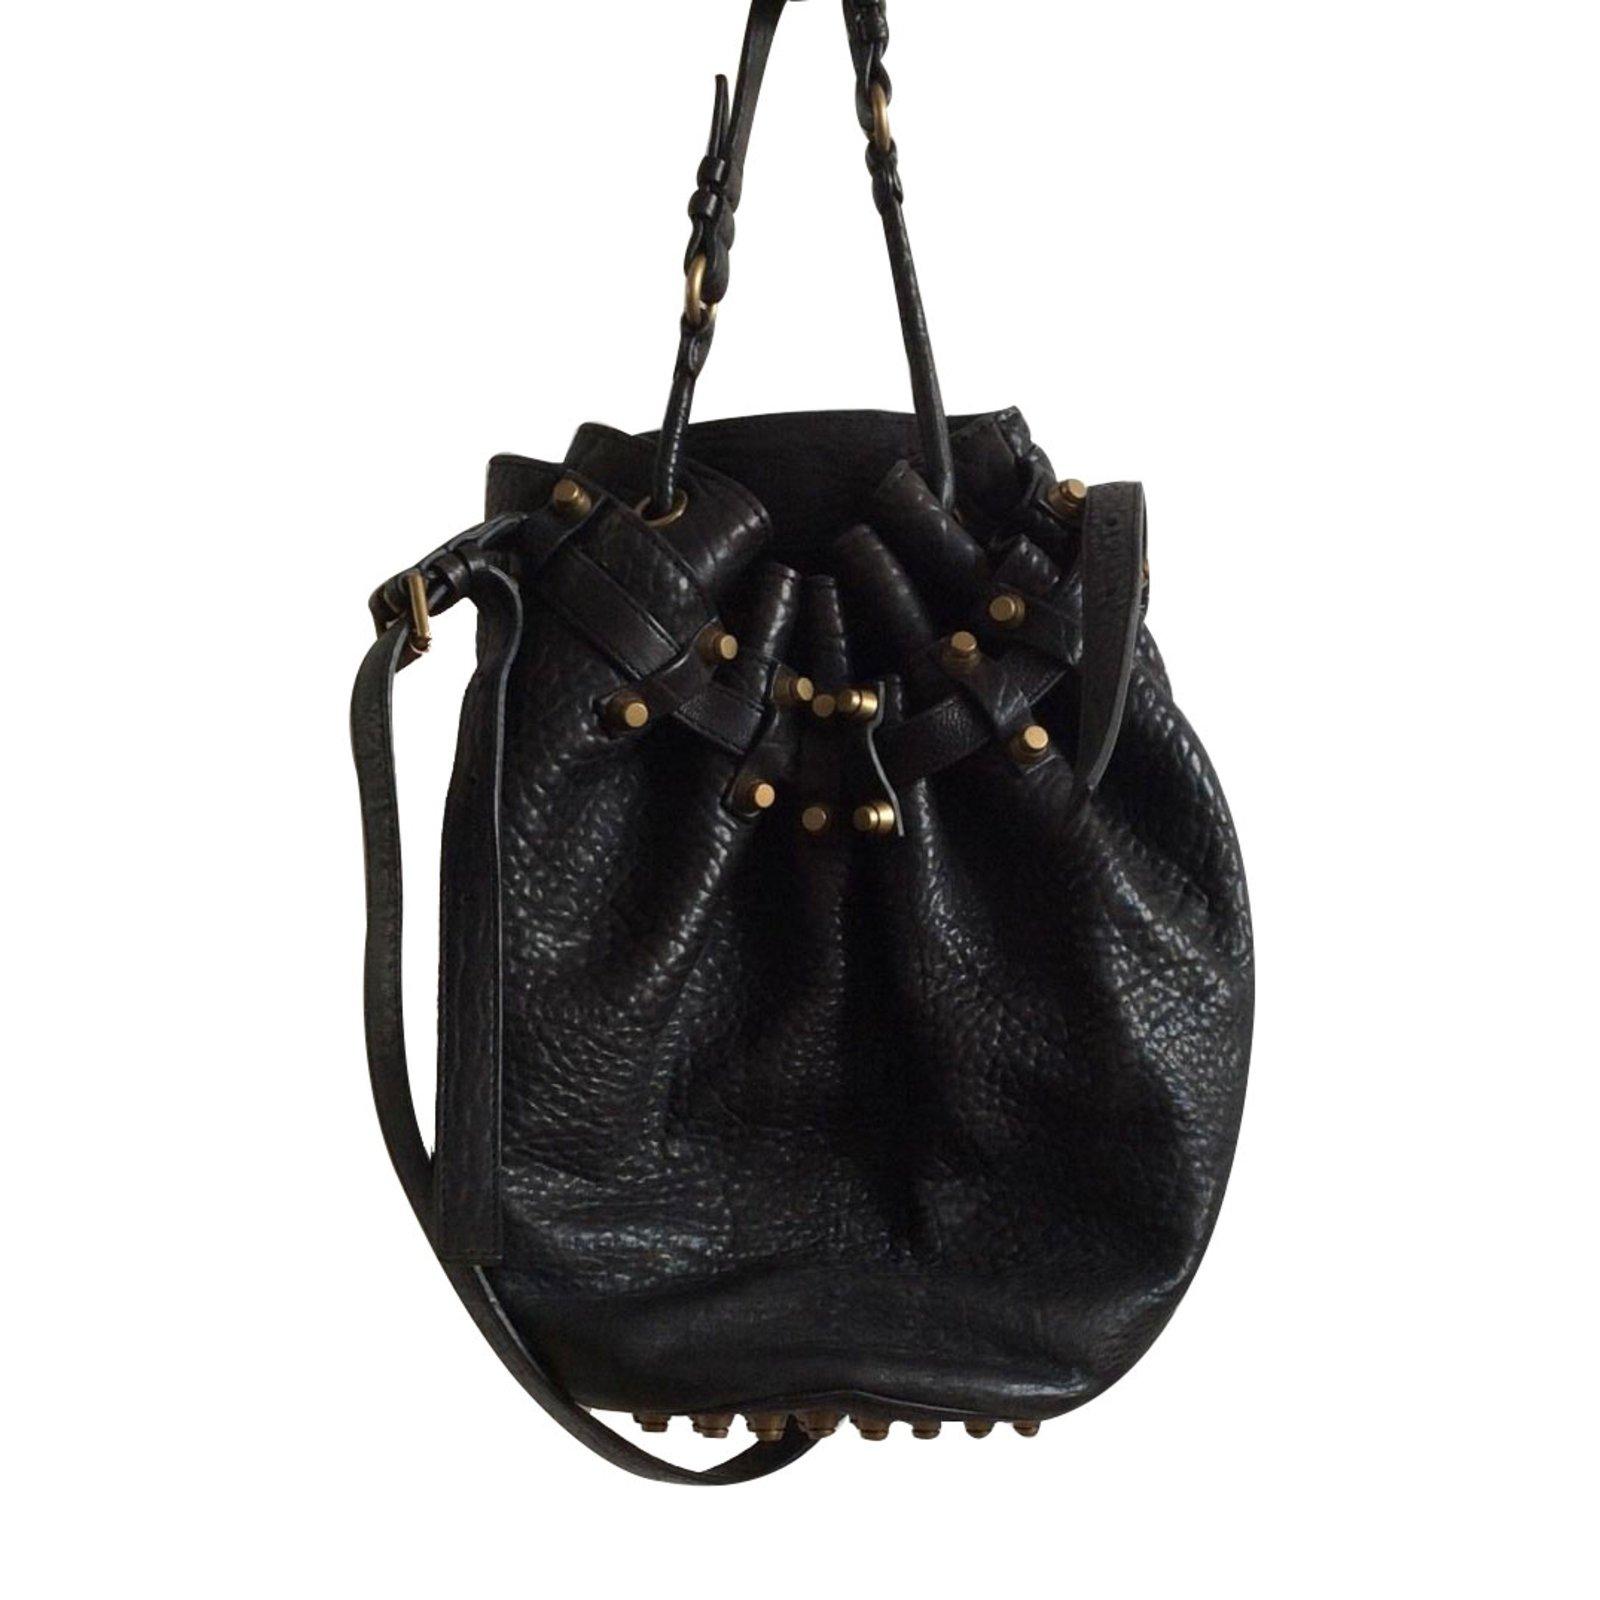 Alexander Handbags Leather Black Ref 10888